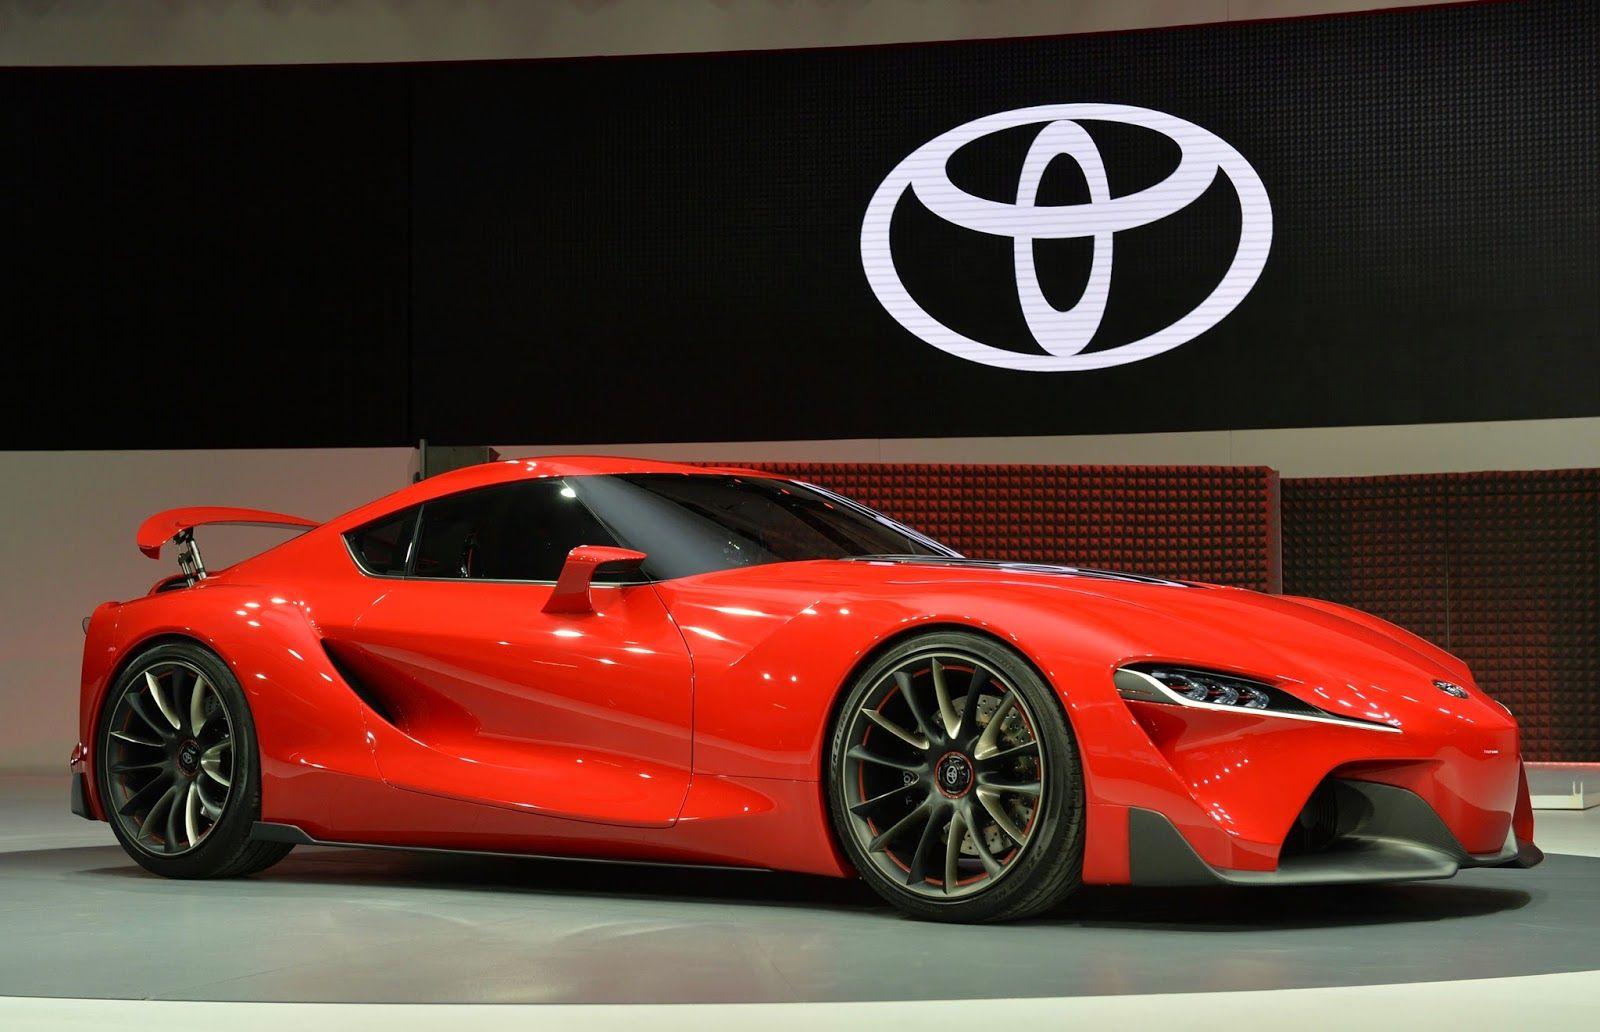 Supra 2015 | Cars | Pinterest | Toyota supra, Toyota and Cars